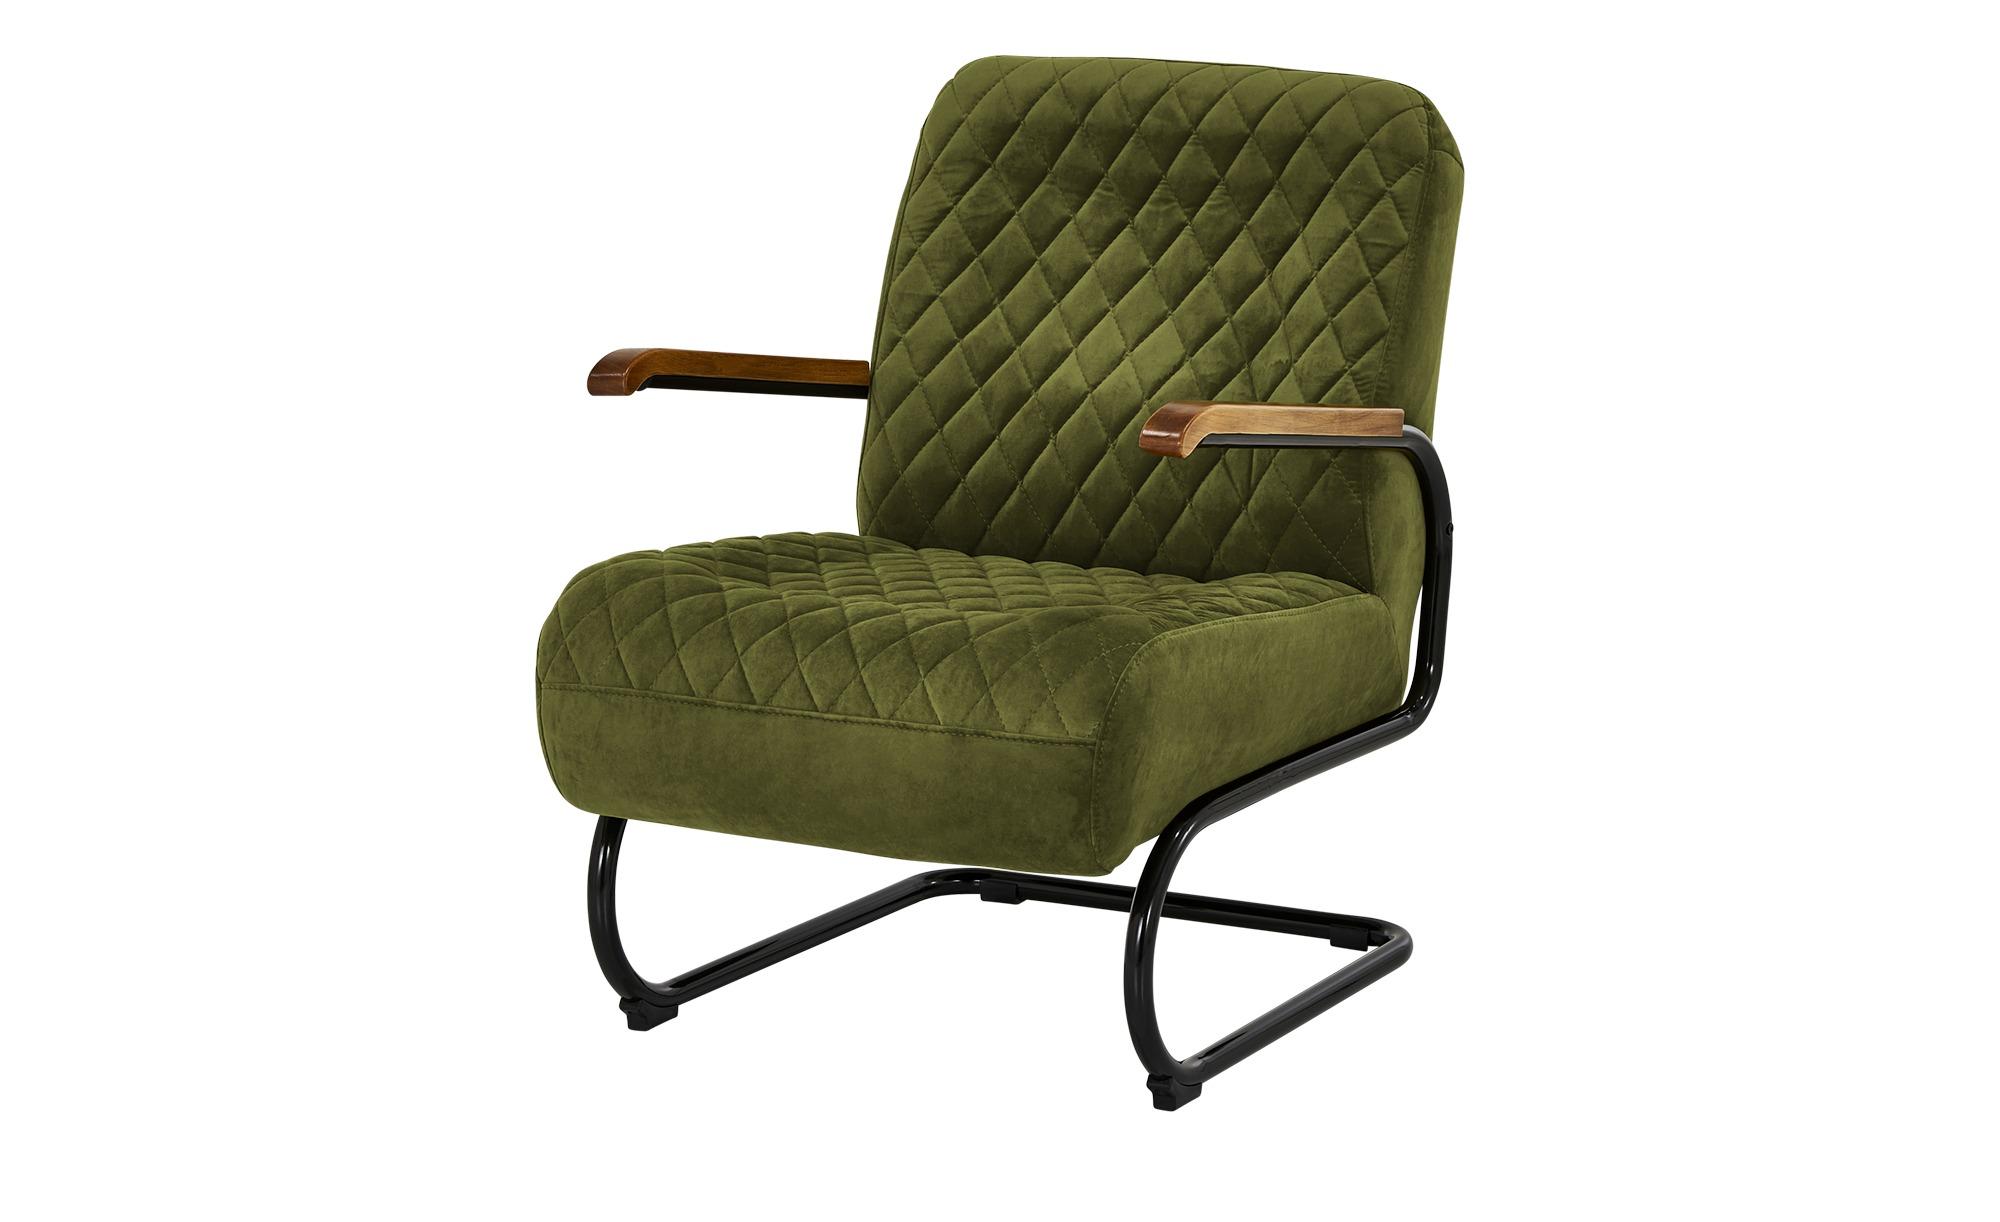 Sessel  Trudi ¦ grün ¦ Maße (cm): B: 67 H: 100 T: 83 Polstermöbel > Sessel > Polstersessel - Höffner